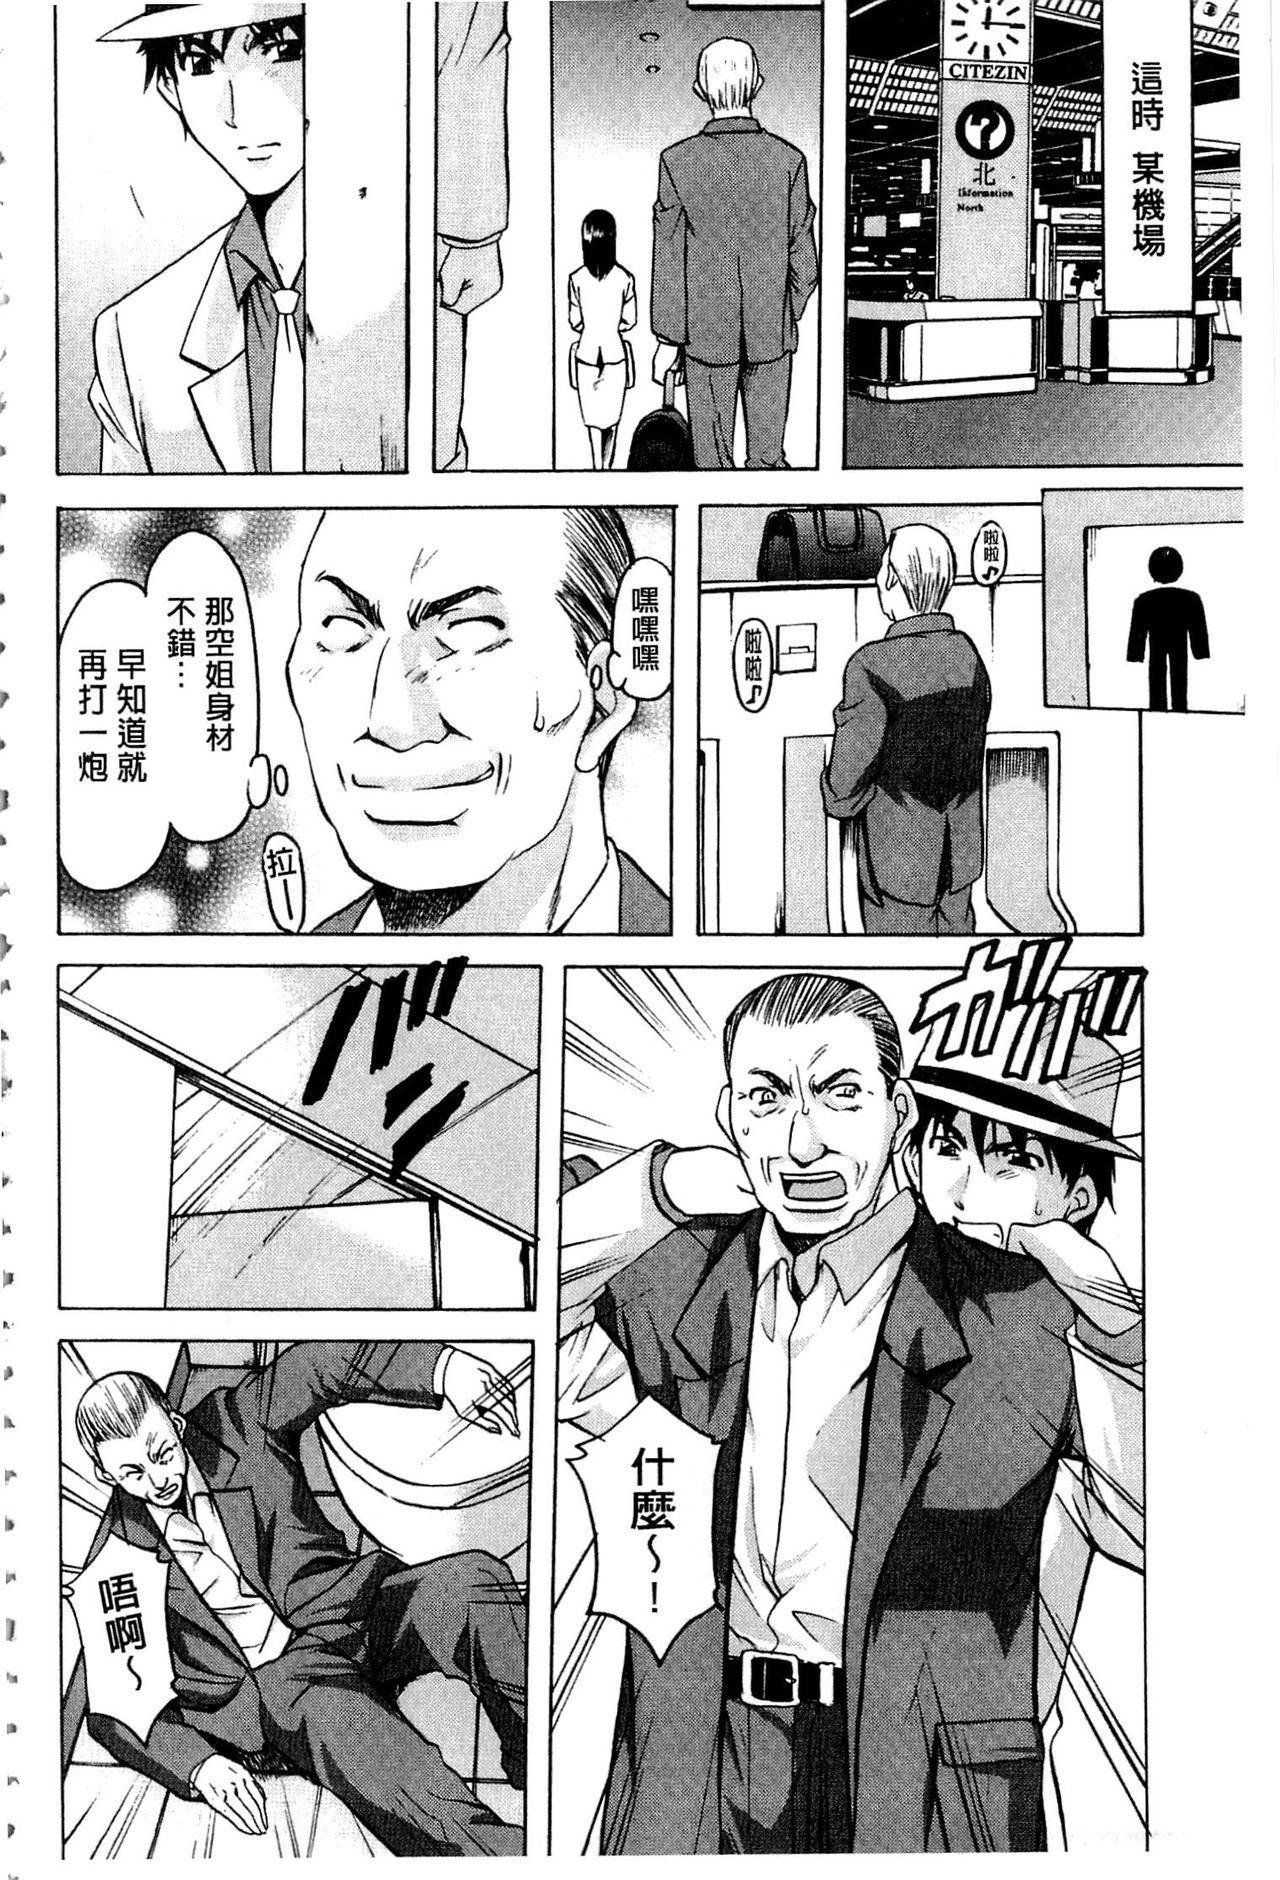 Sennyu Tsuma Satomi Kiroku | 臥底人妻里美 洗腦凌辱的記錄 上集 29